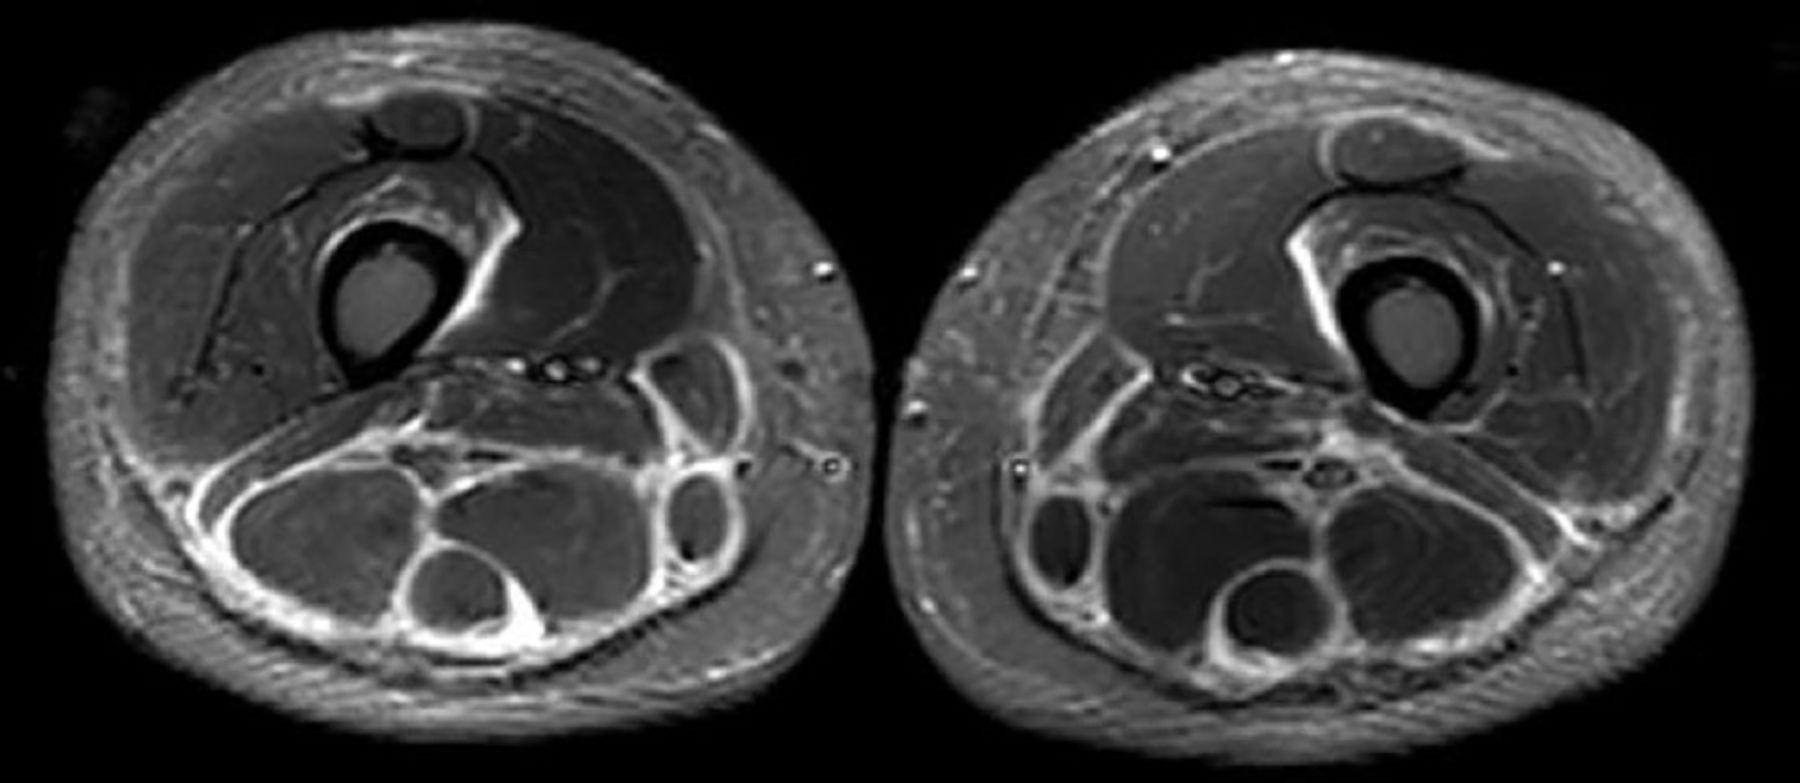 Unusual Presentation Of Eosinophilic Fasciitis Ef With A Raised